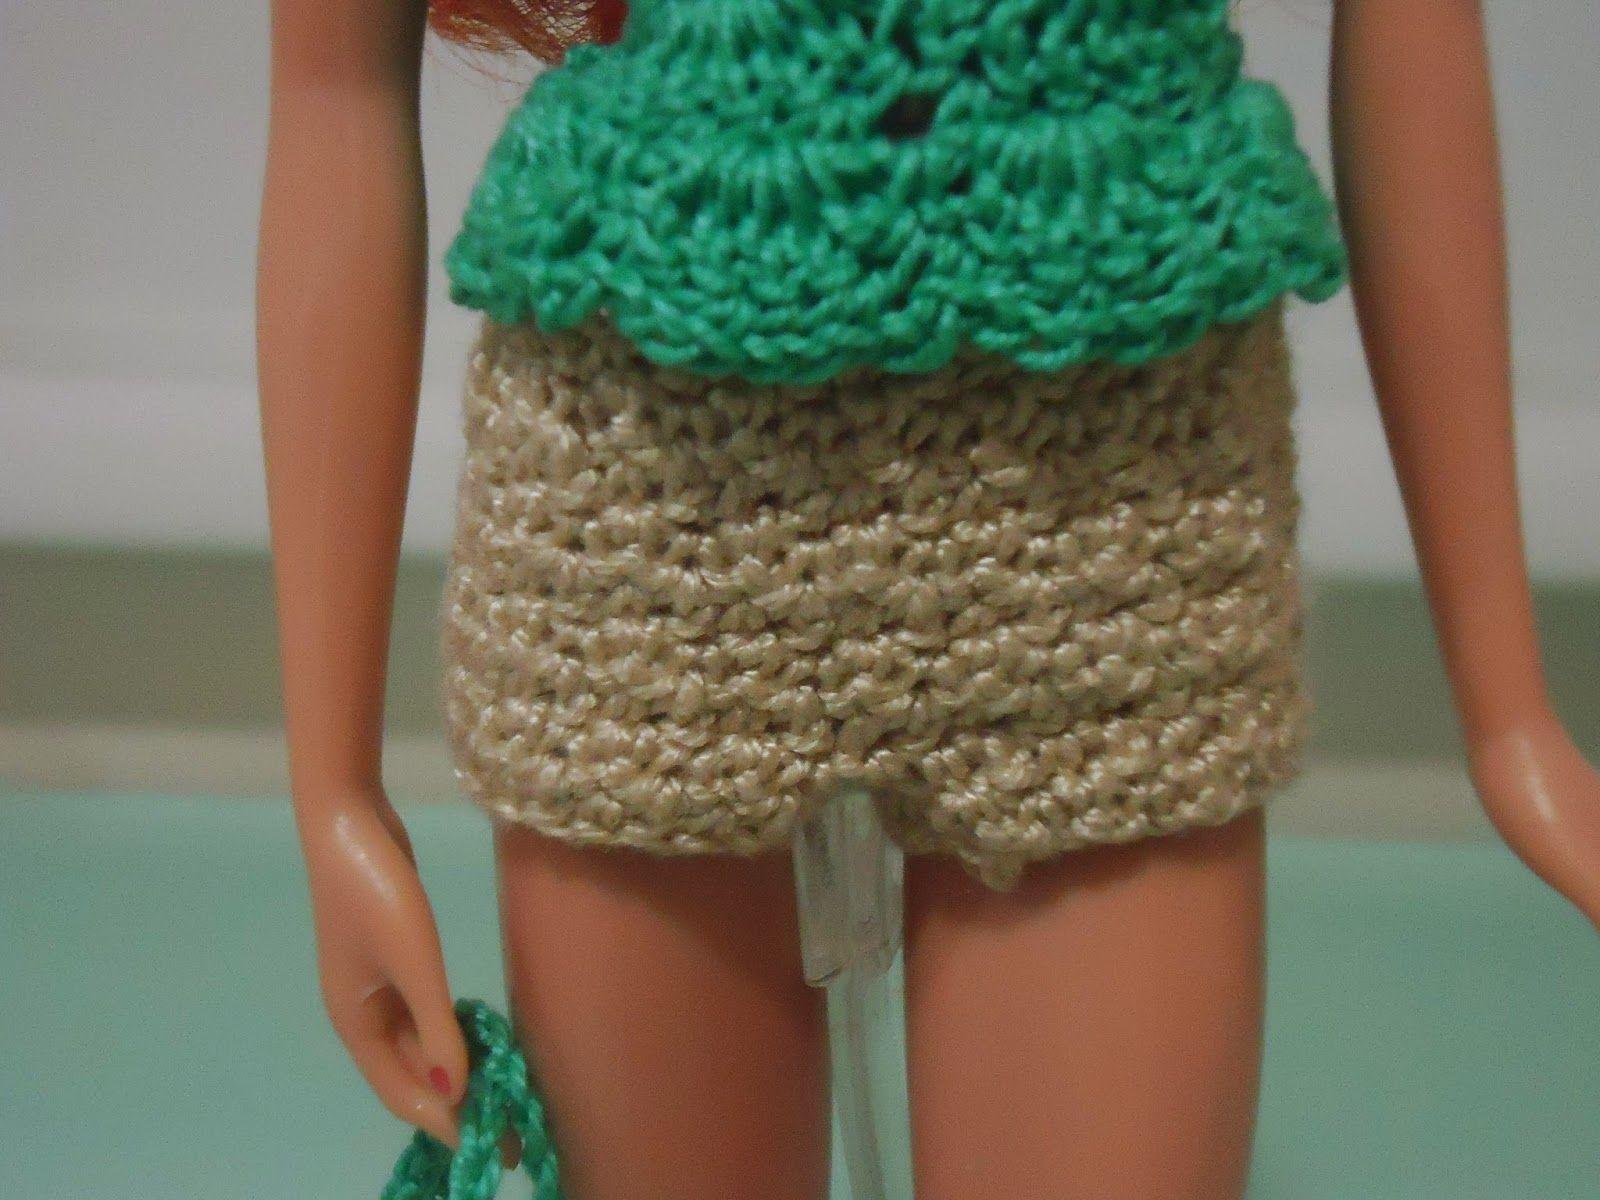 Fashion Doll Crochet Clothes: Barbie Mini Skirt Turned Into Shorts ...